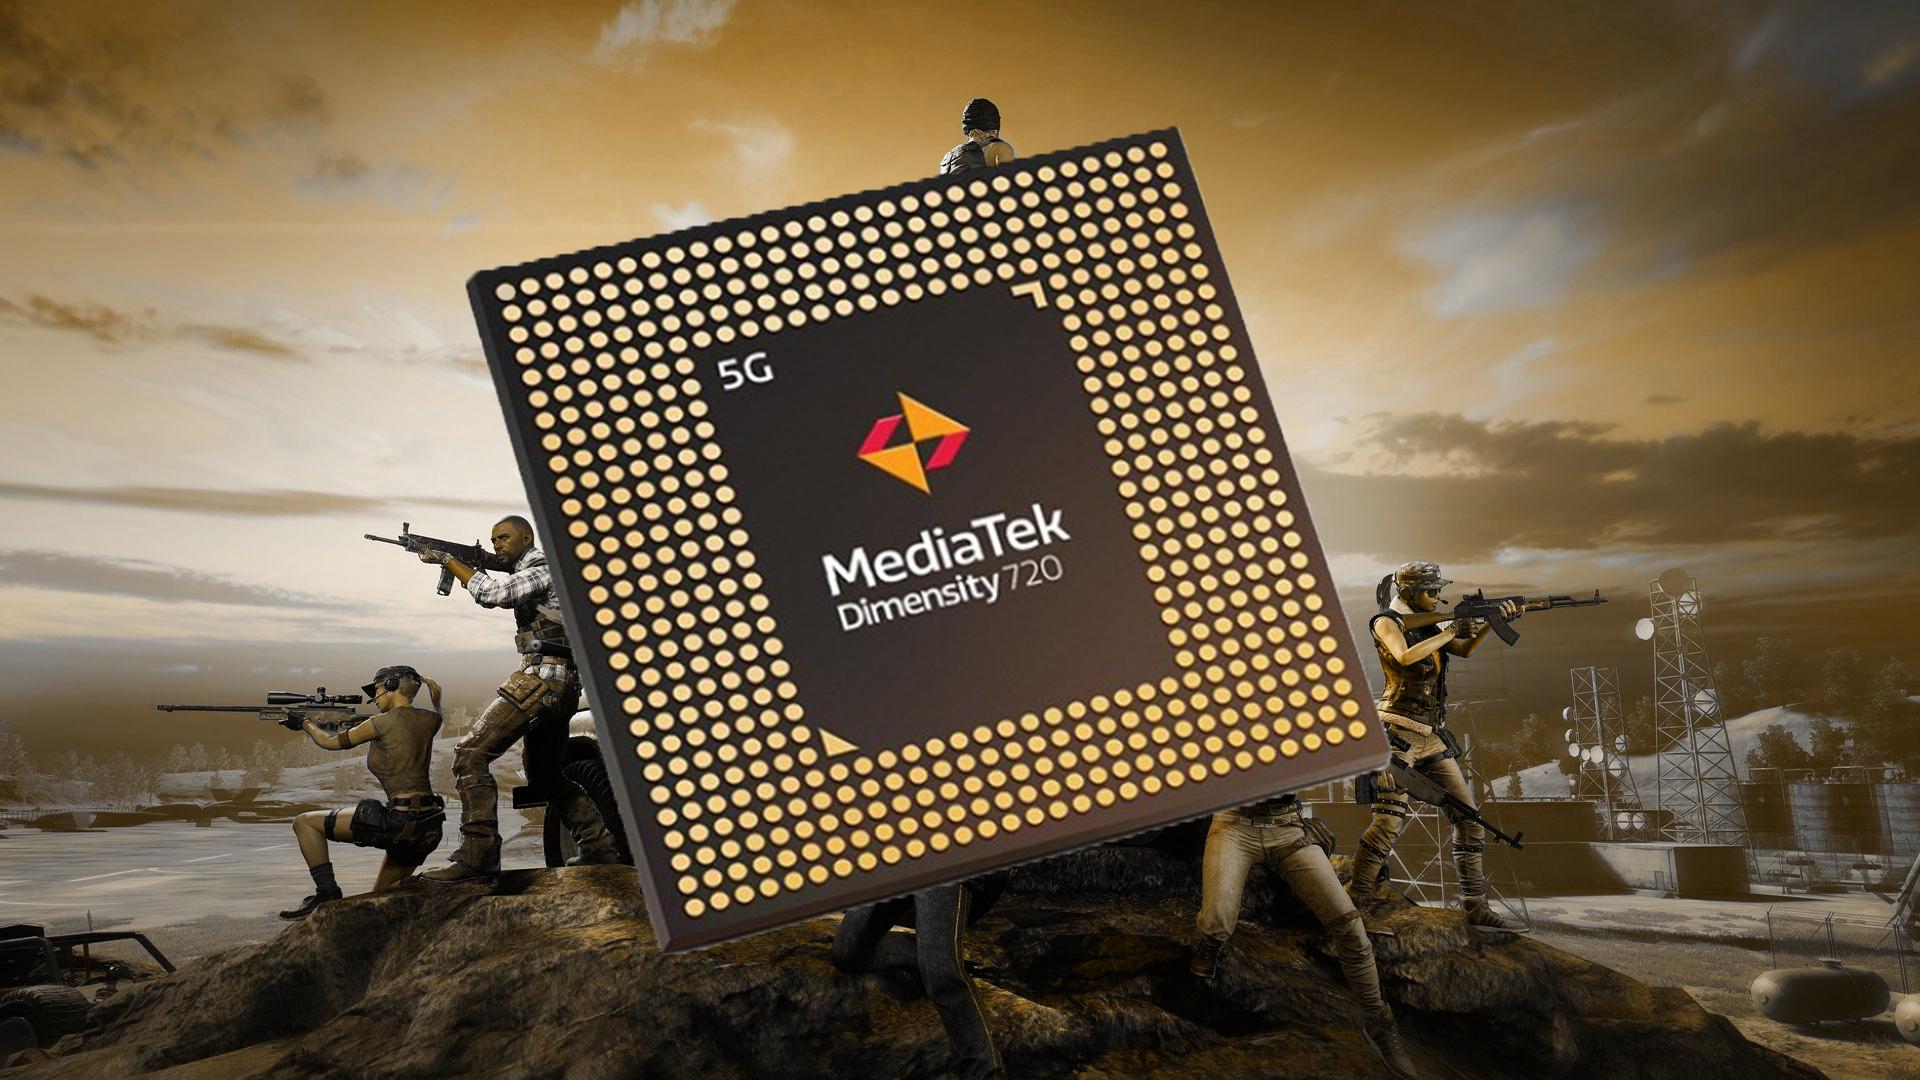 MediaTek, 5G'li <a href='/akilli-telefon/'>akıllı telefon</a> işlemcisi <a href='/dimensity/'>Dimensity</a> 720 piyasaya sürdü.